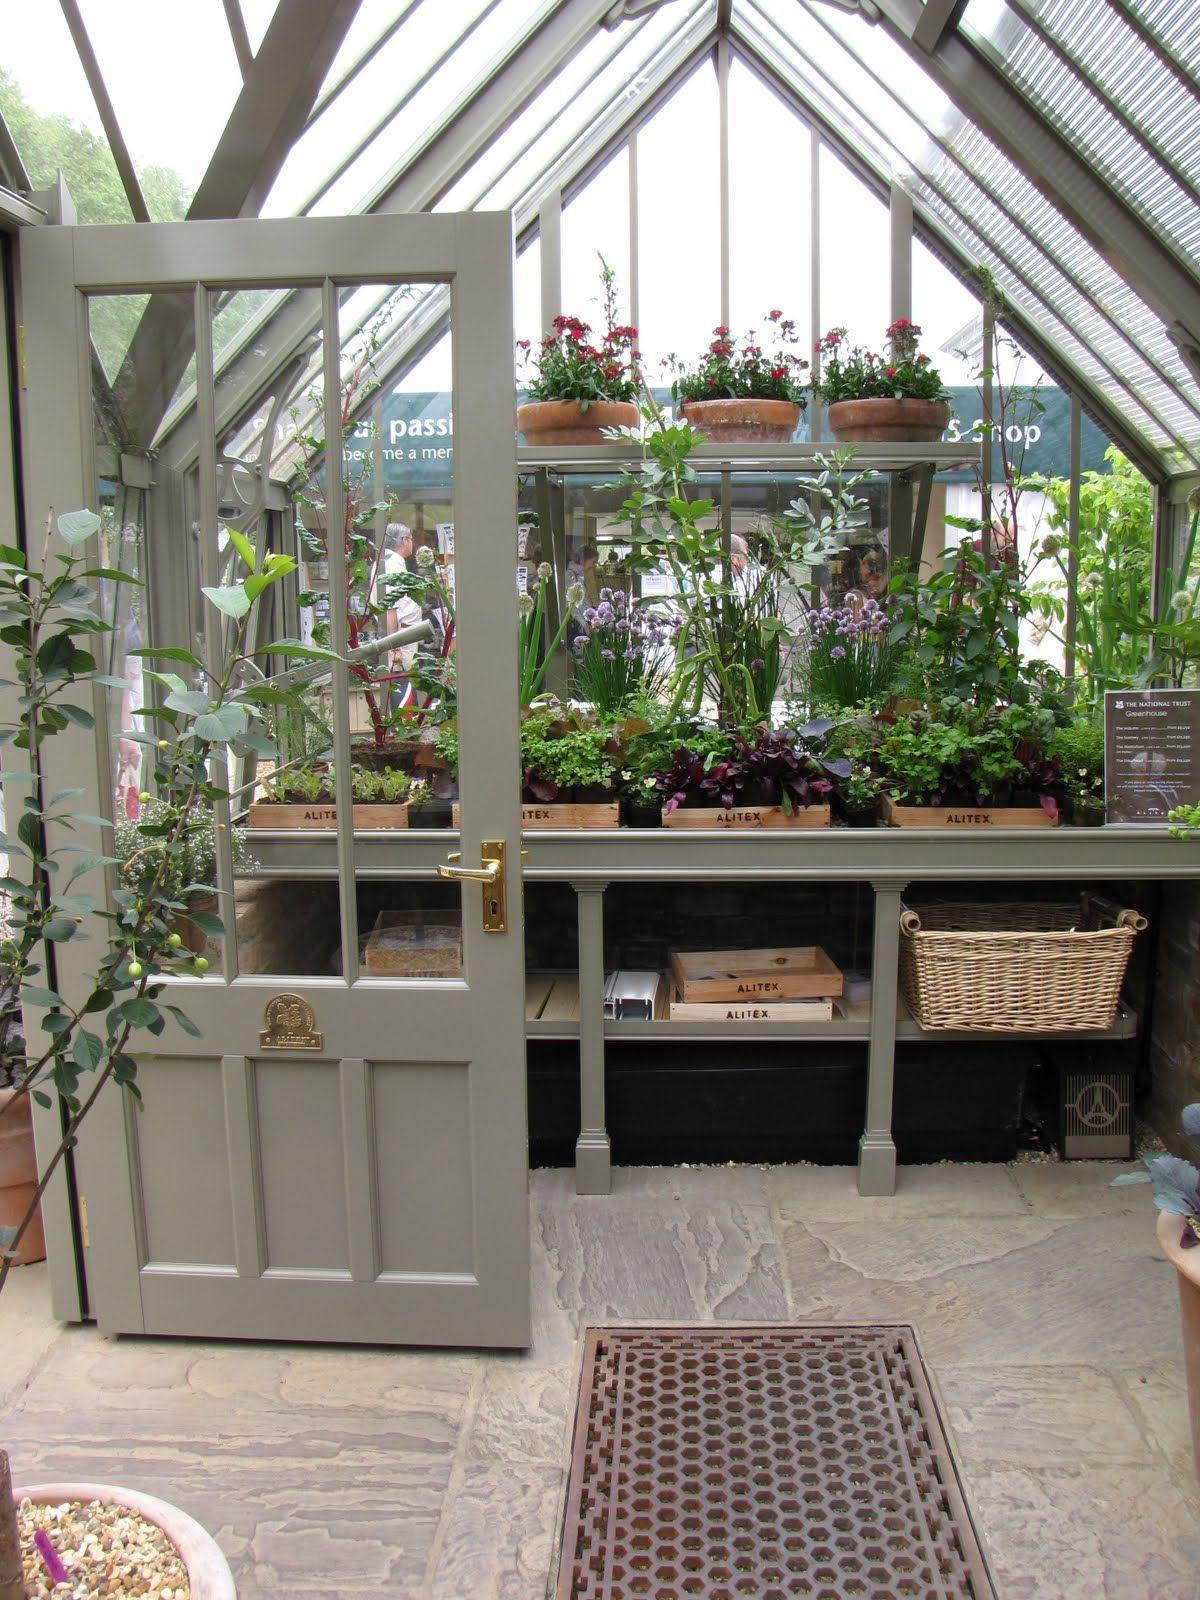 Greenhouse abrigos de jardim estufas garden shed for Estufas de jardin